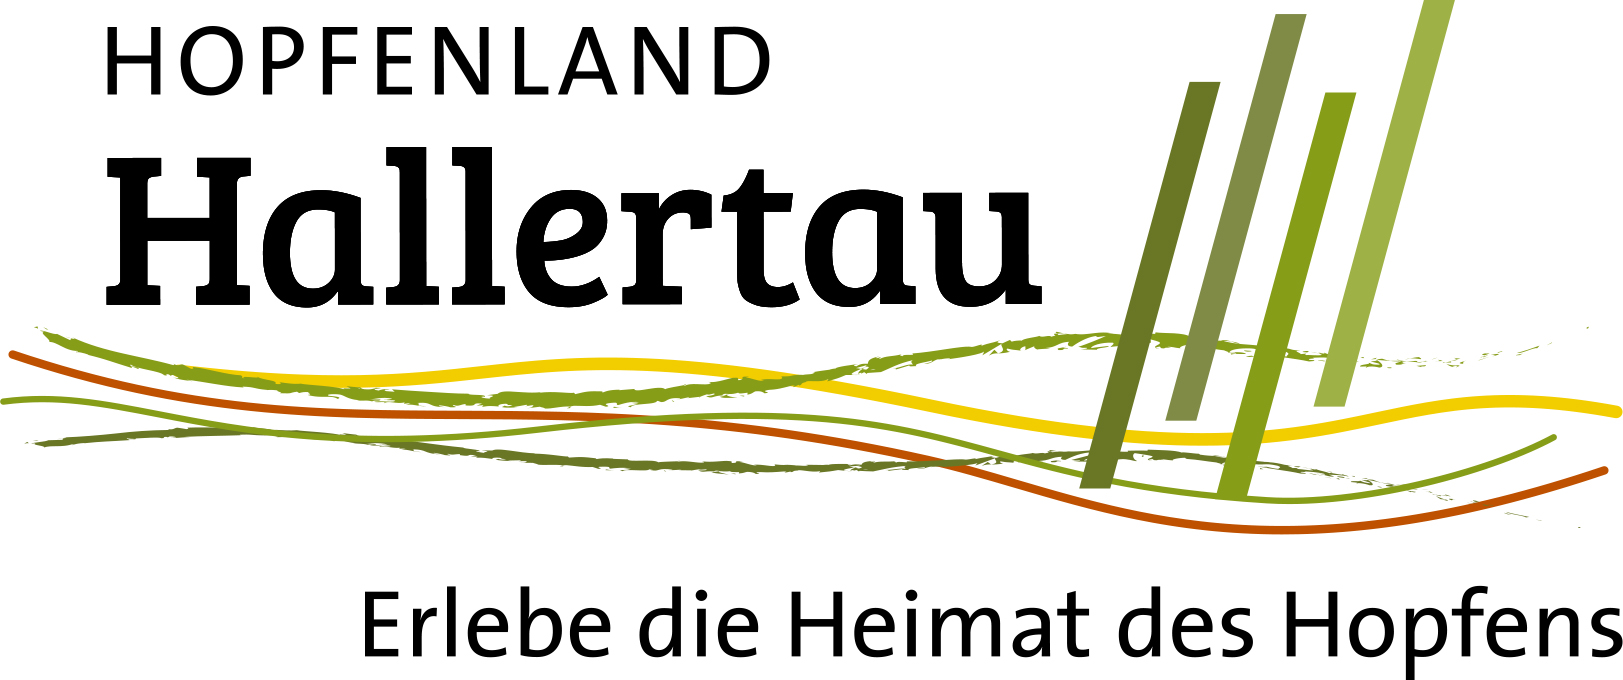 Neues Logo für Hopfenland Hallertau Tourismus e.V.